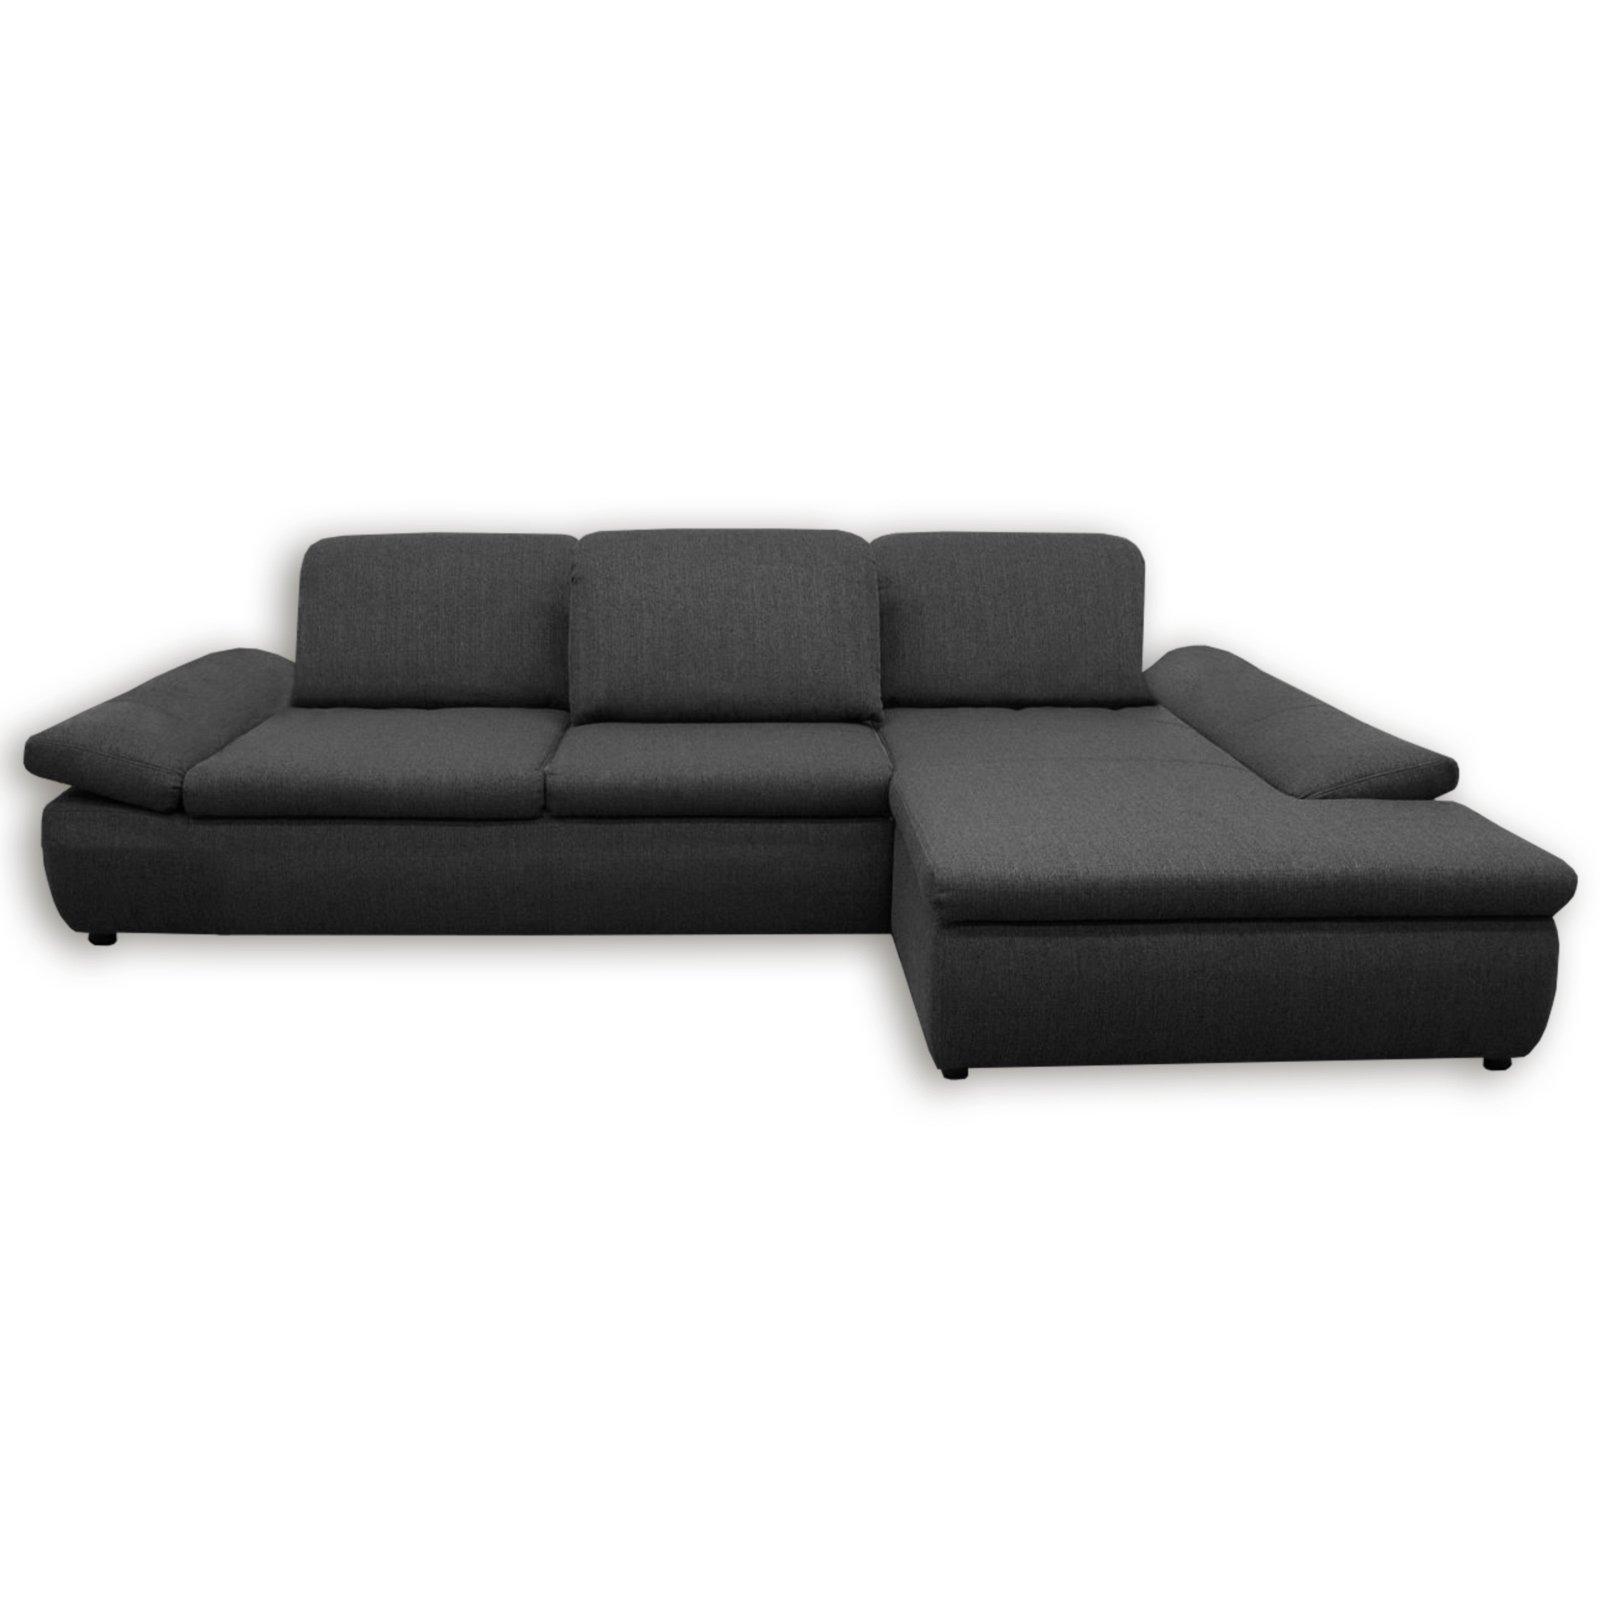 boxspringsofa dunkelgrau mit funktionen recamiere rechts ecksofas l form sofas. Black Bedroom Furniture Sets. Home Design Ideas